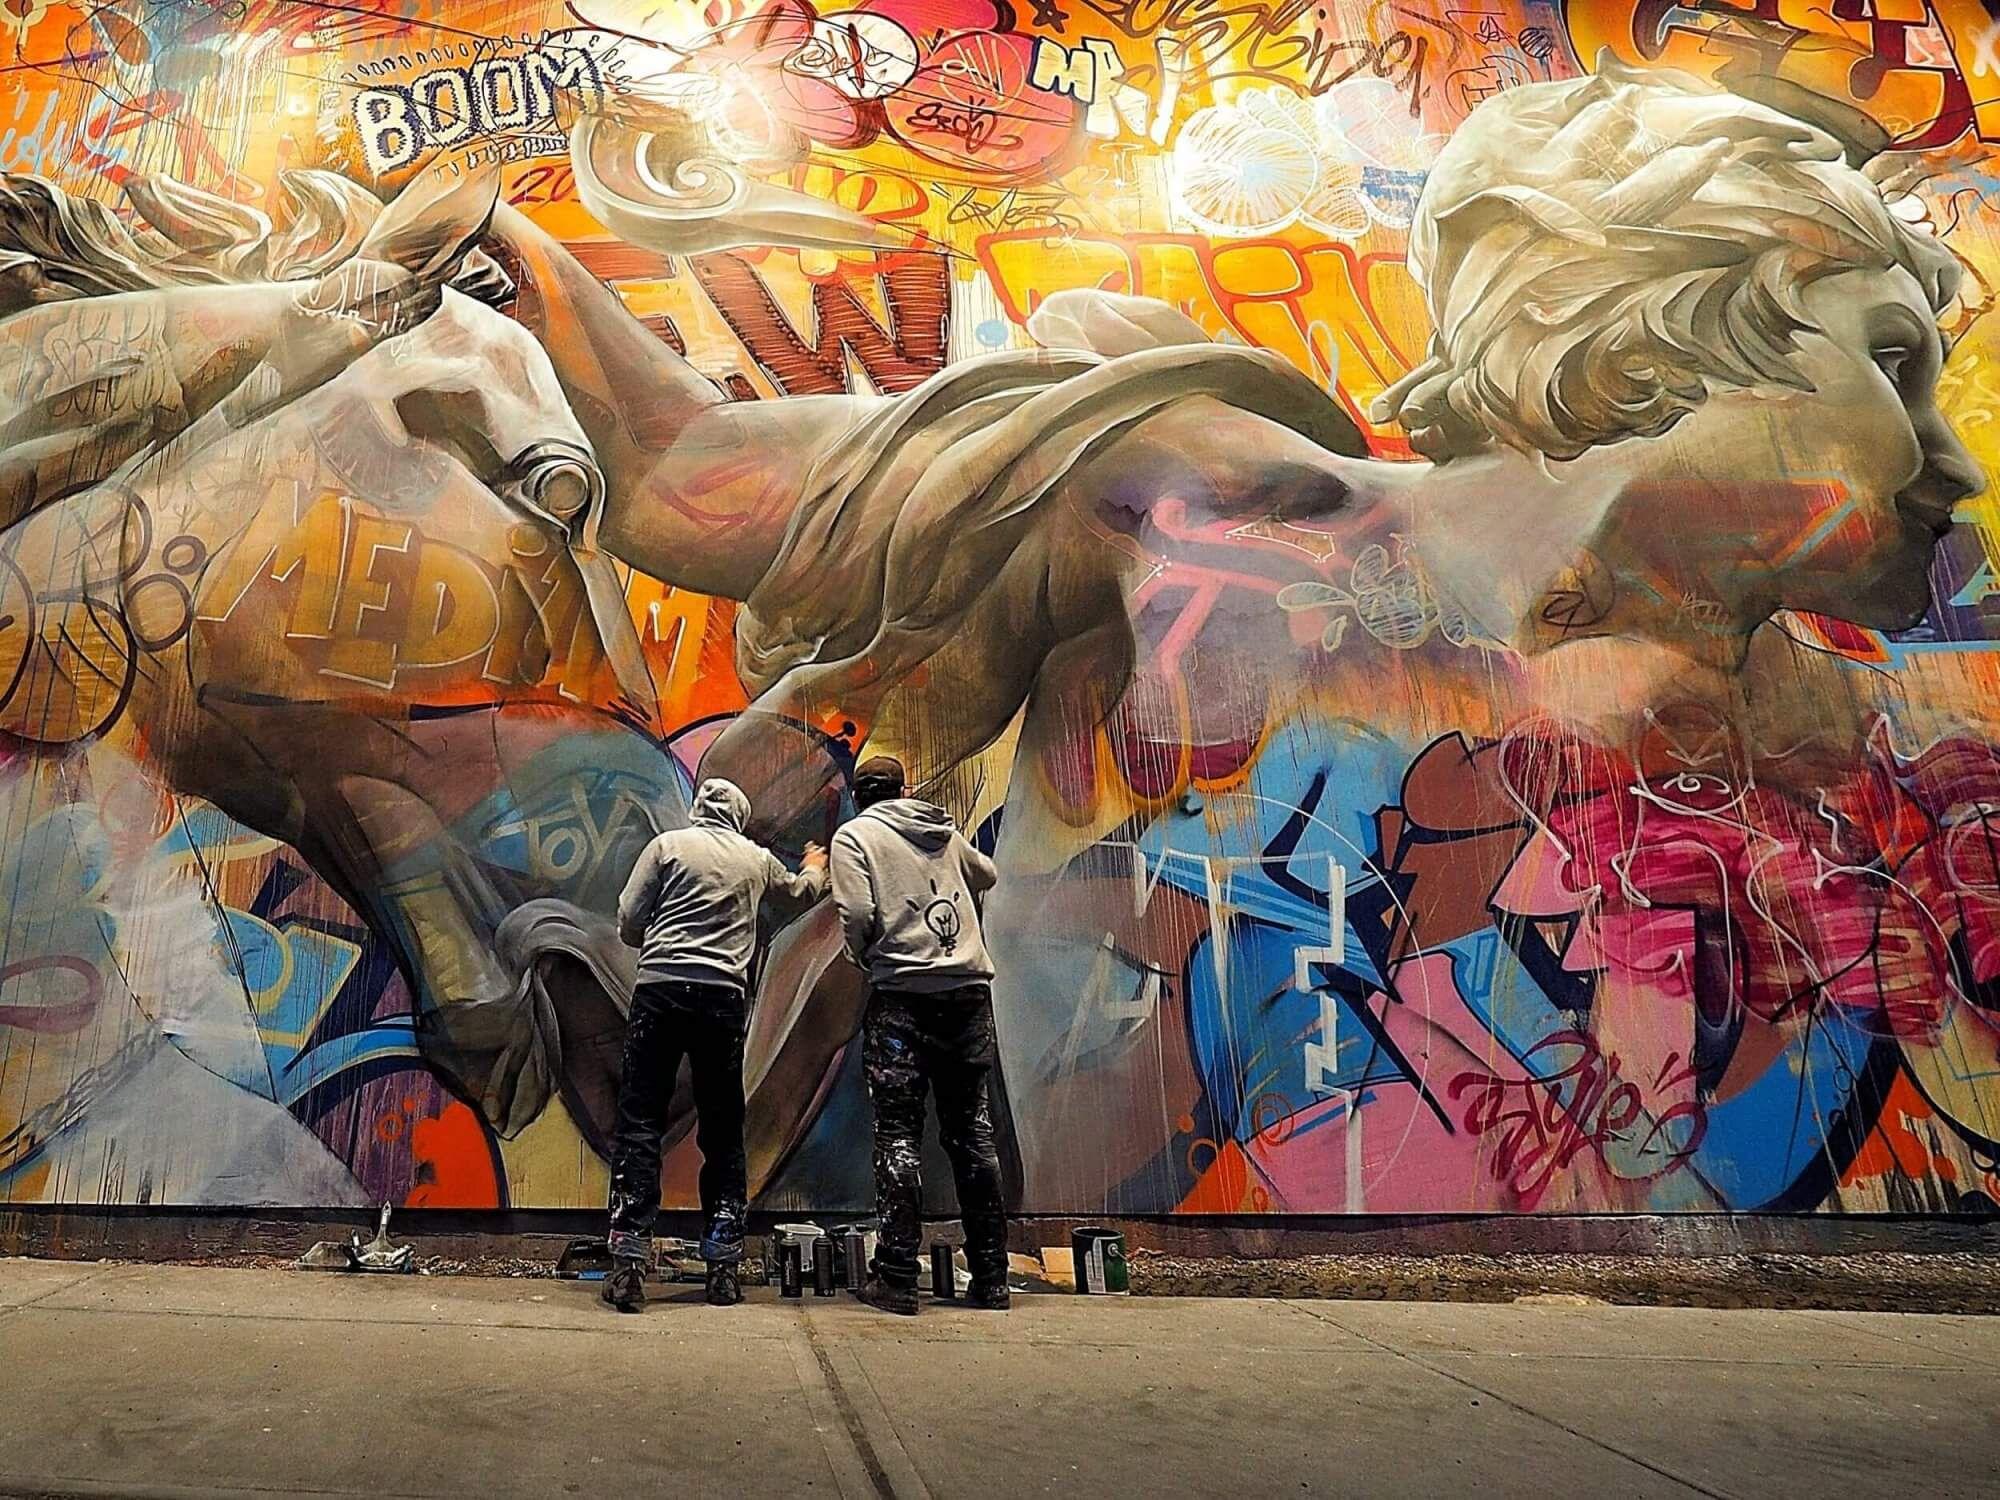 Pin By Toy Society On Beautiful Art Design Pinterest - Beautiful giant murals greek gods pichi avo